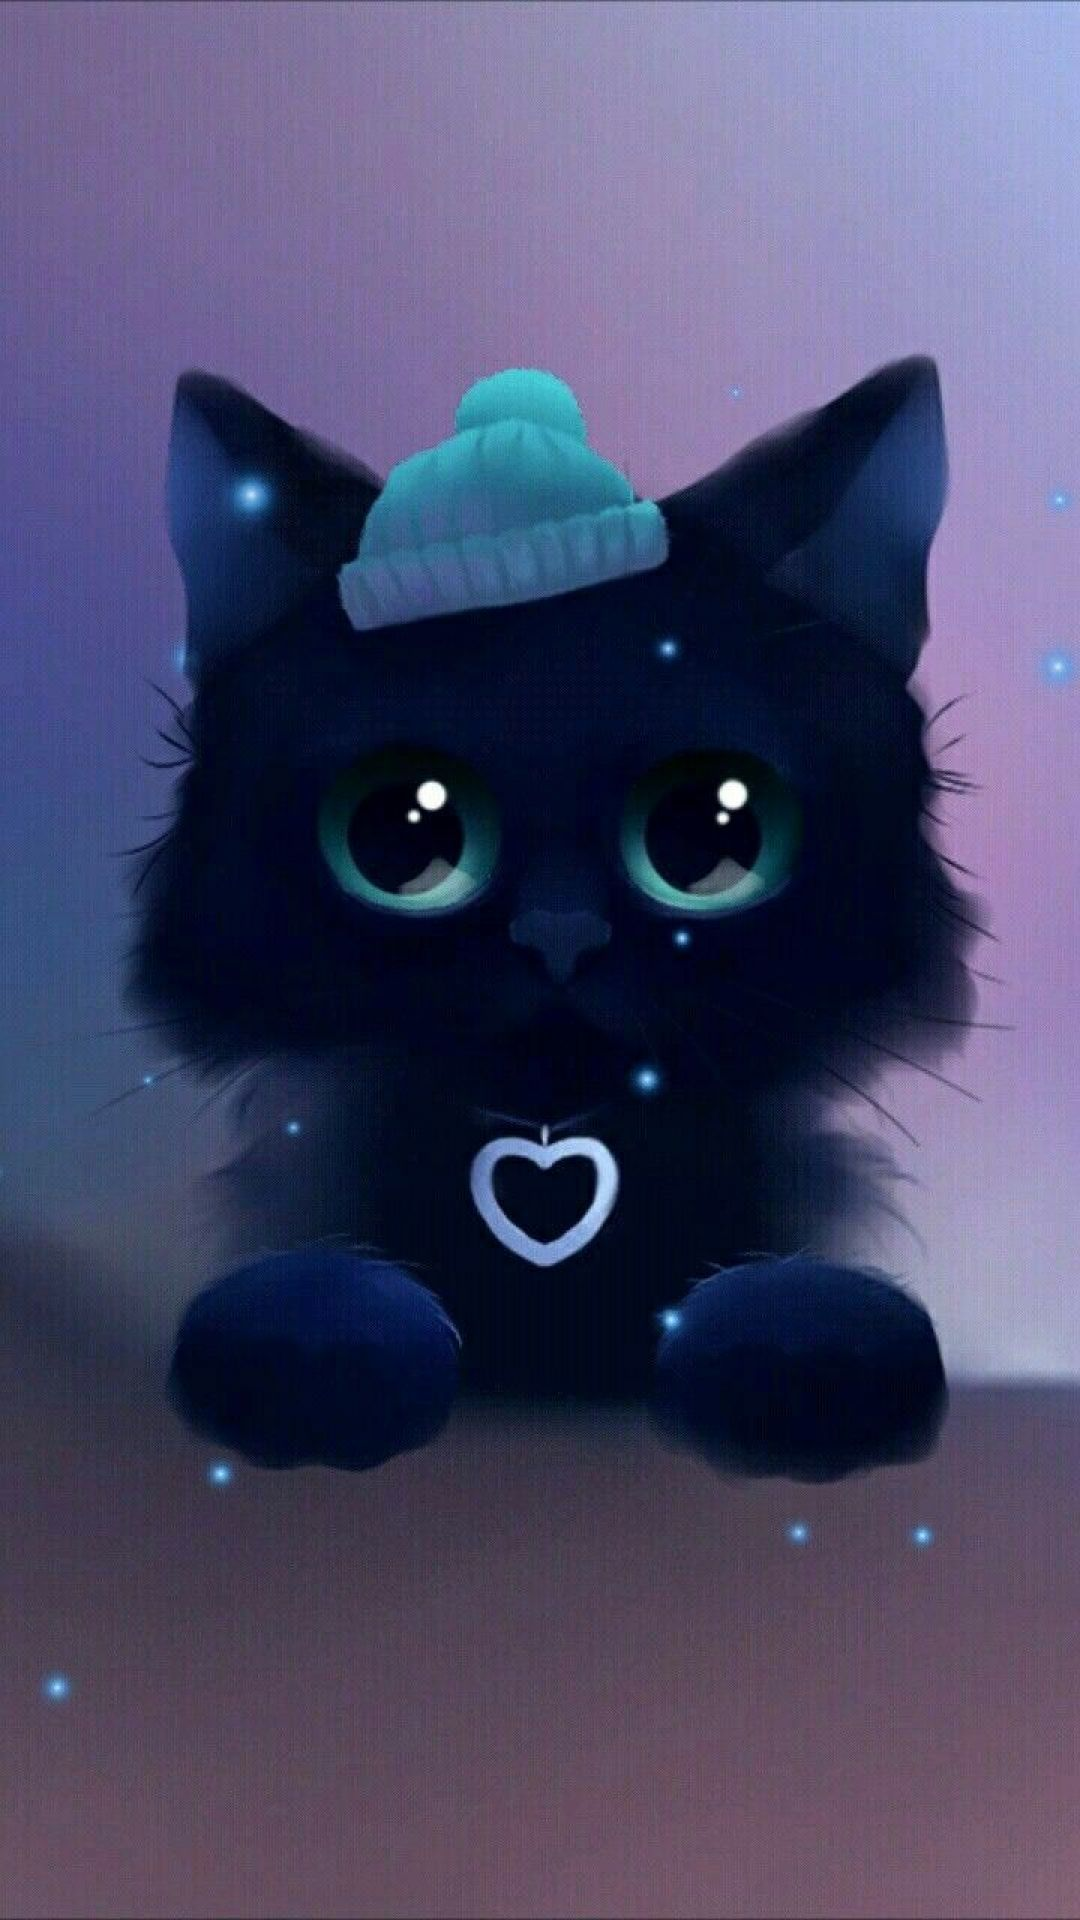 Kawaii Anime Cat Android Iphone Desktop Hd Backgrounds Wallpapers 1080p 4k 112426 Cute Animal Drawings Kawaii Cute Animal Drawings Cute Anime Cat